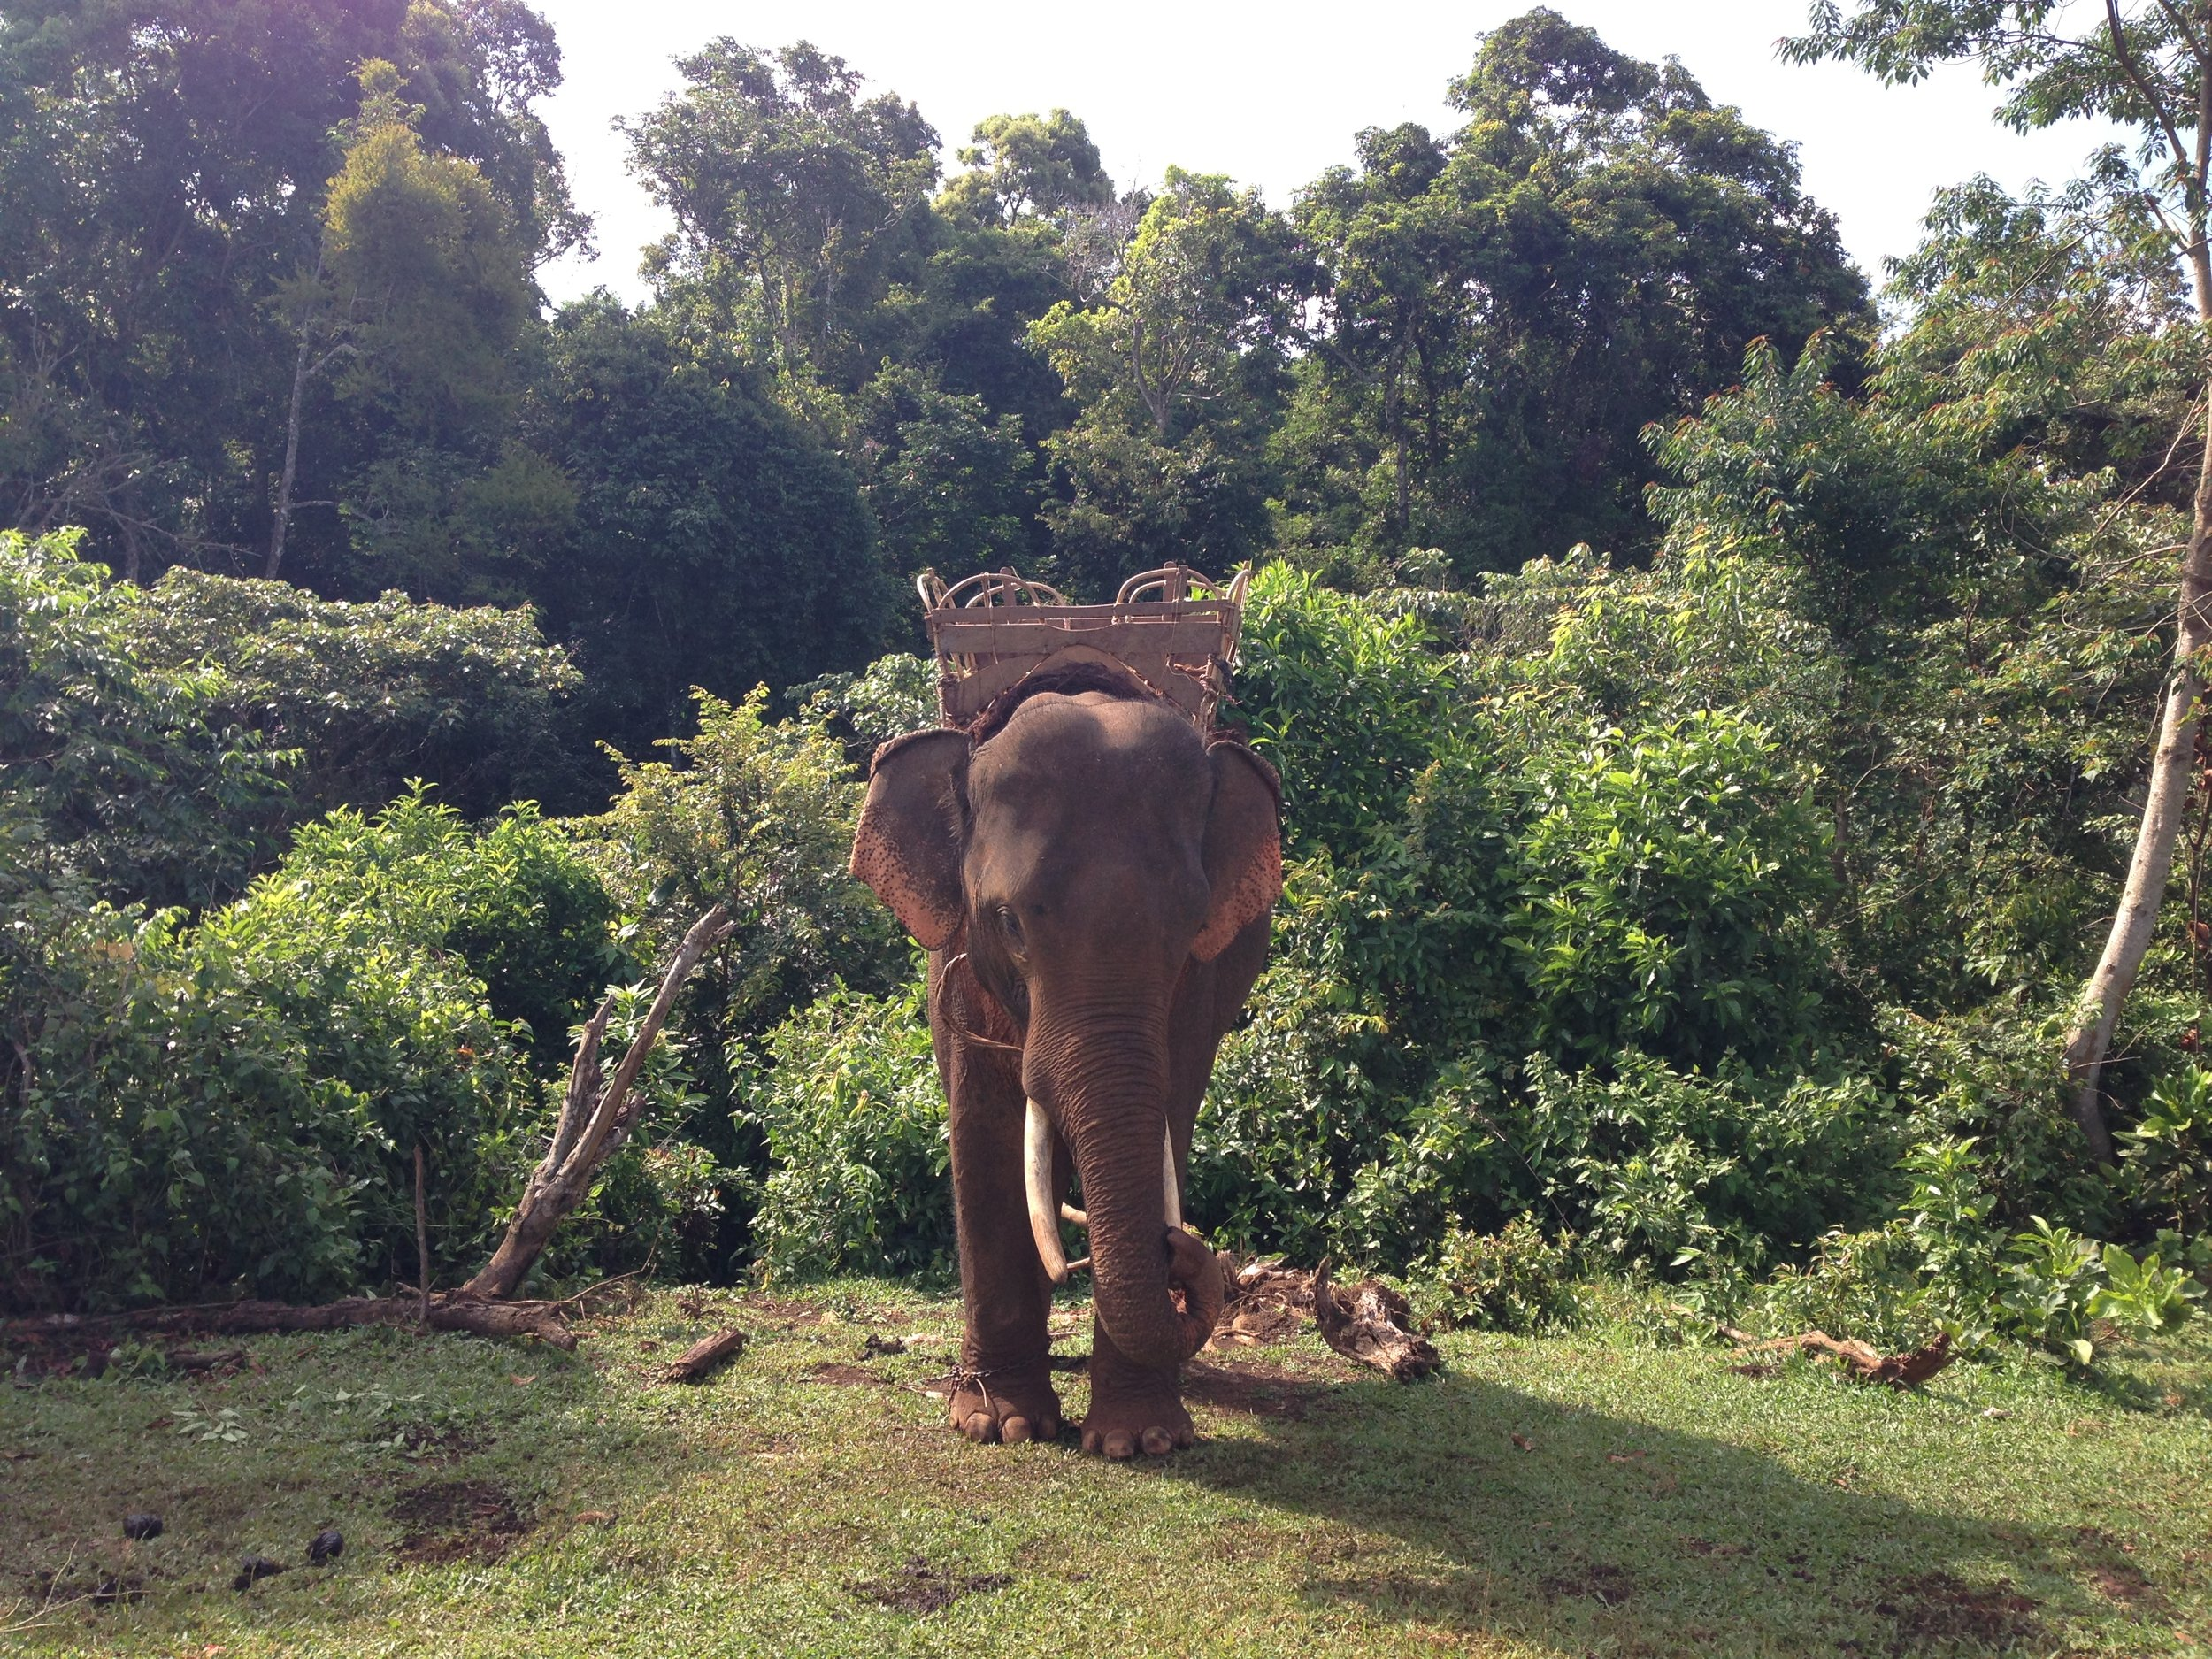 LDHE - elephant 3 - photoArnaudBouquet.jpg